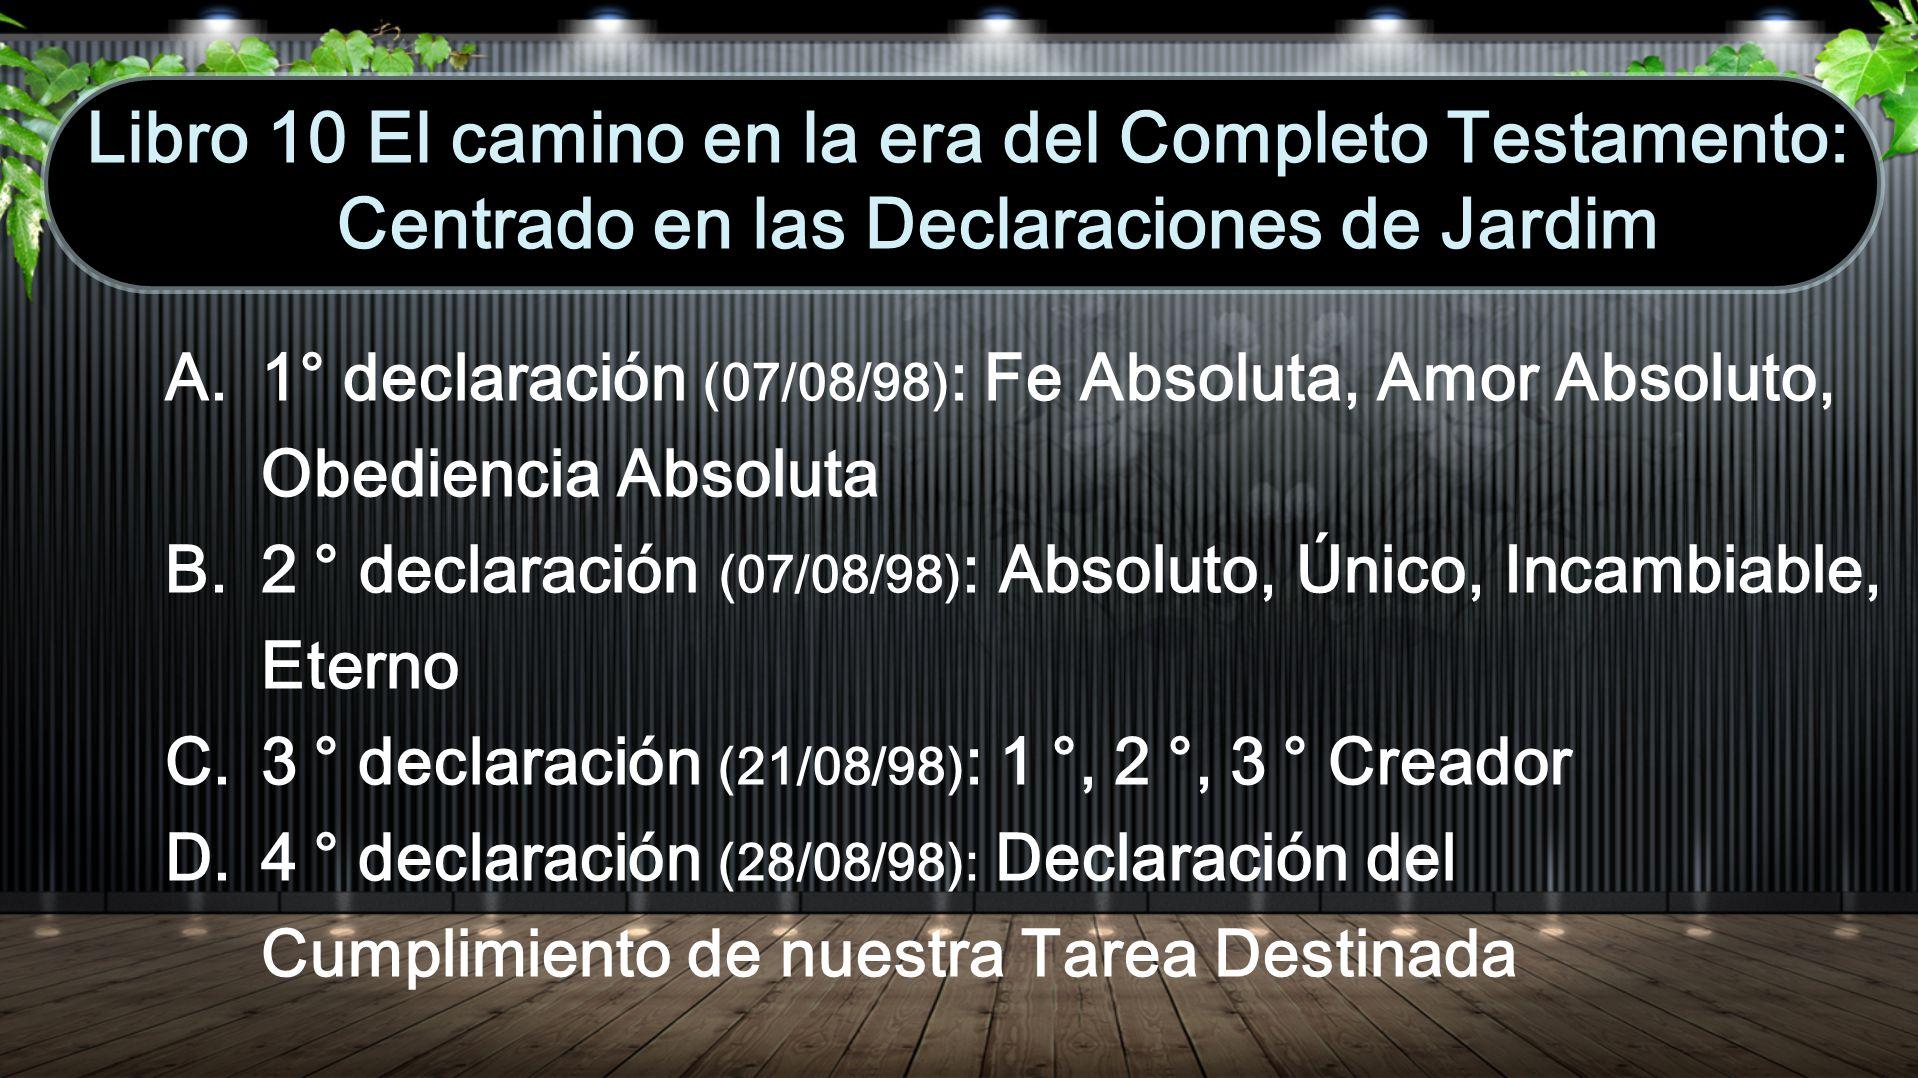 A. 1 ° declaración (07/08/98) : Fe Absoluta, Amor Absoluto, Obediencia Absoluta B. 2 ° declaración (07/08/98) : Absoluto, Único, Incambiable, Eterno C